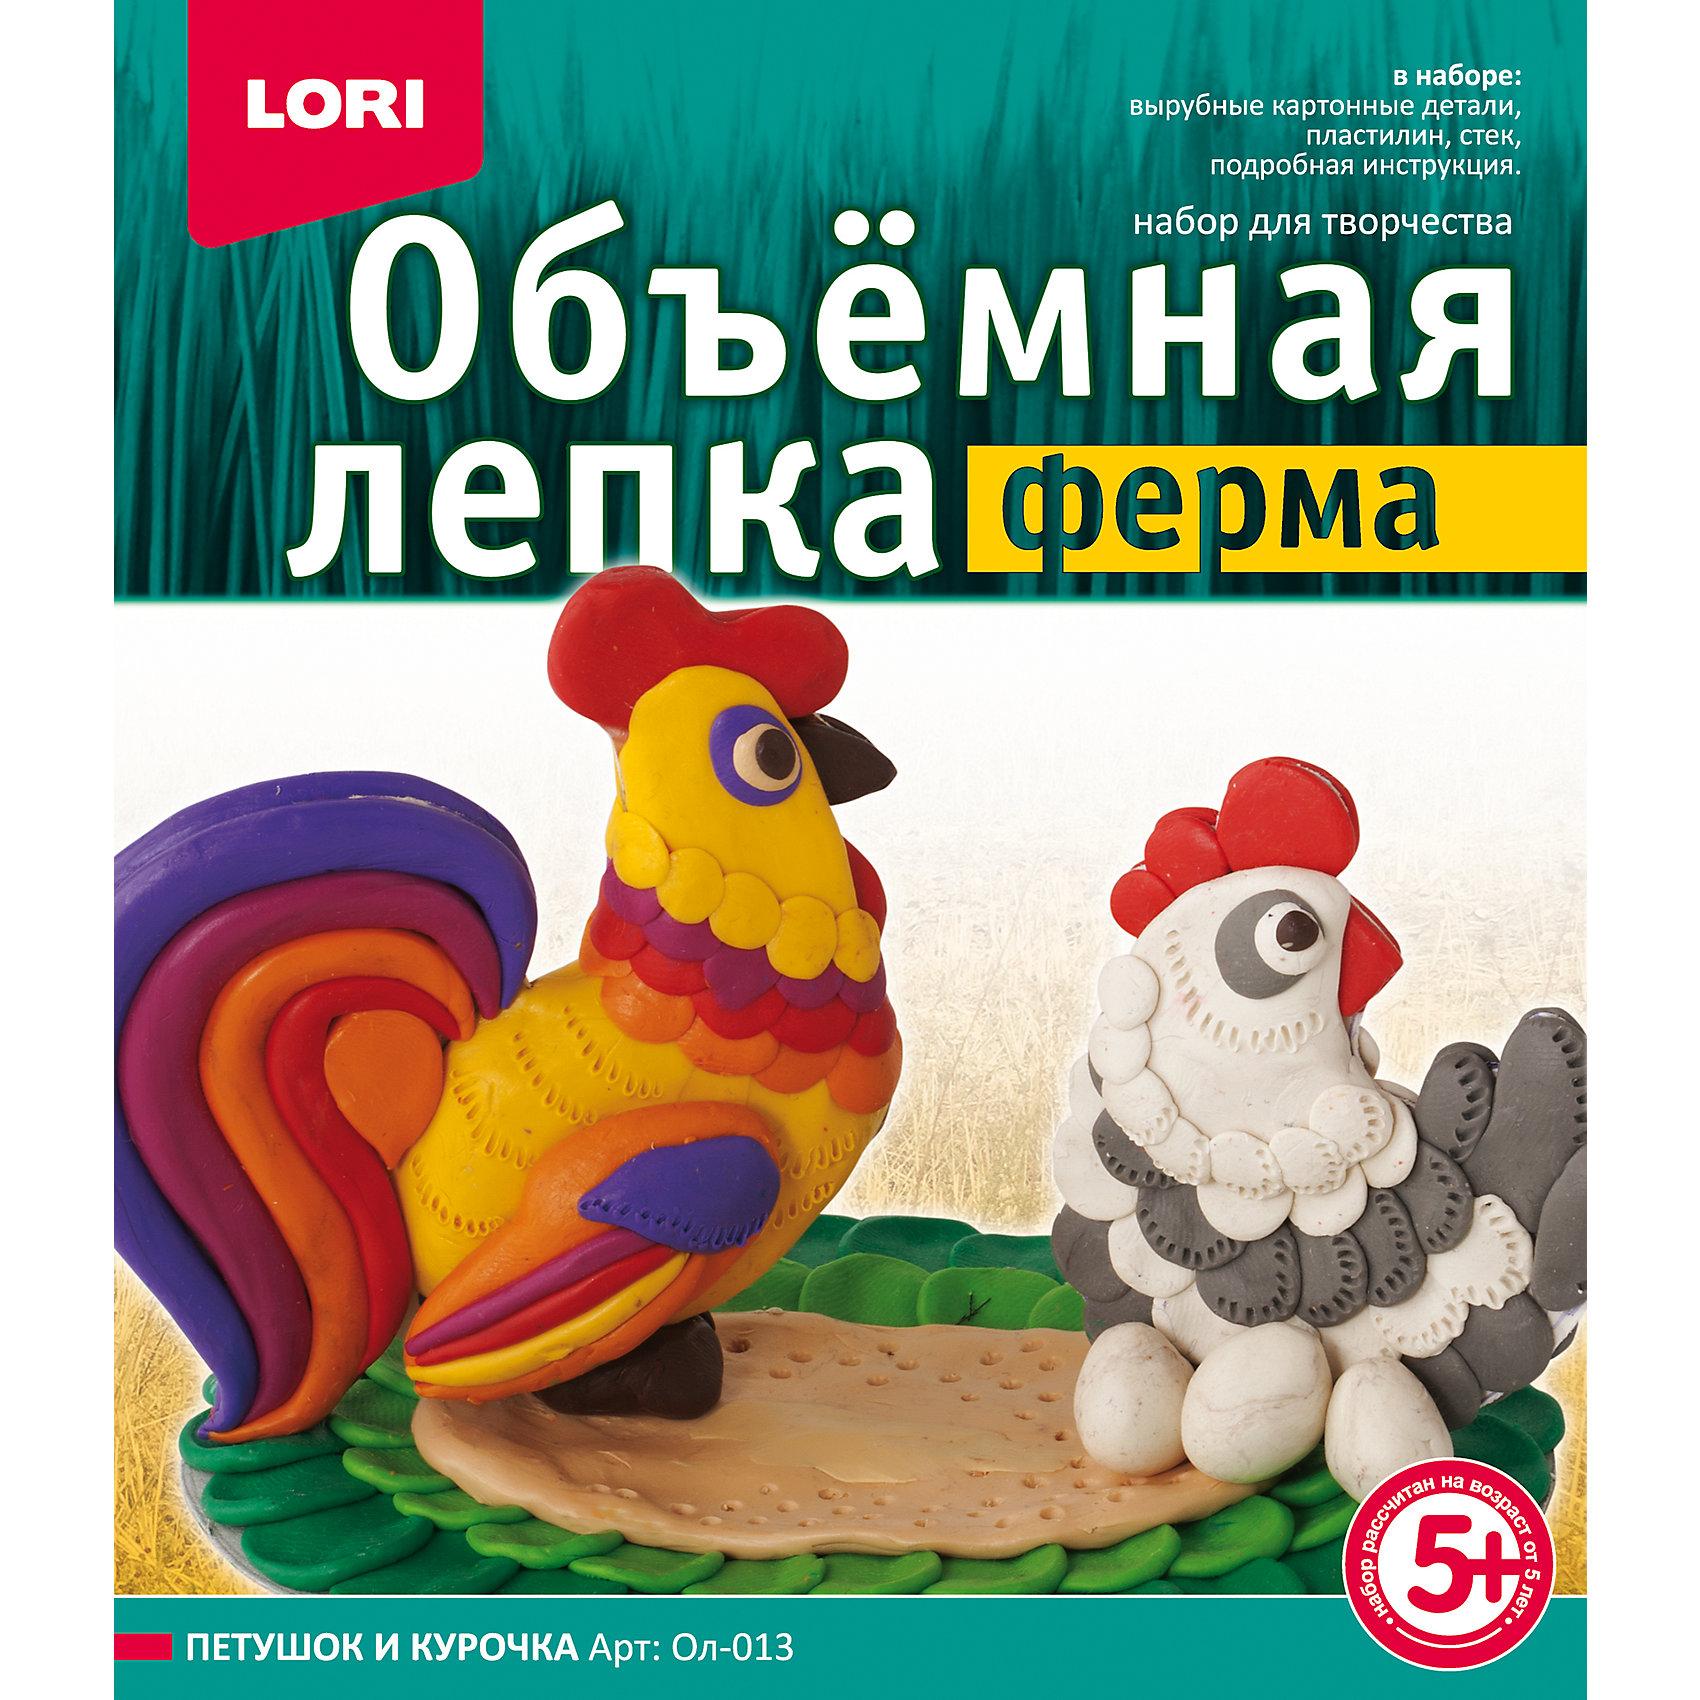 LORI Лепка объемная, Ферма «Петушок и курочка» пластилин lori принцессы 12 цветов